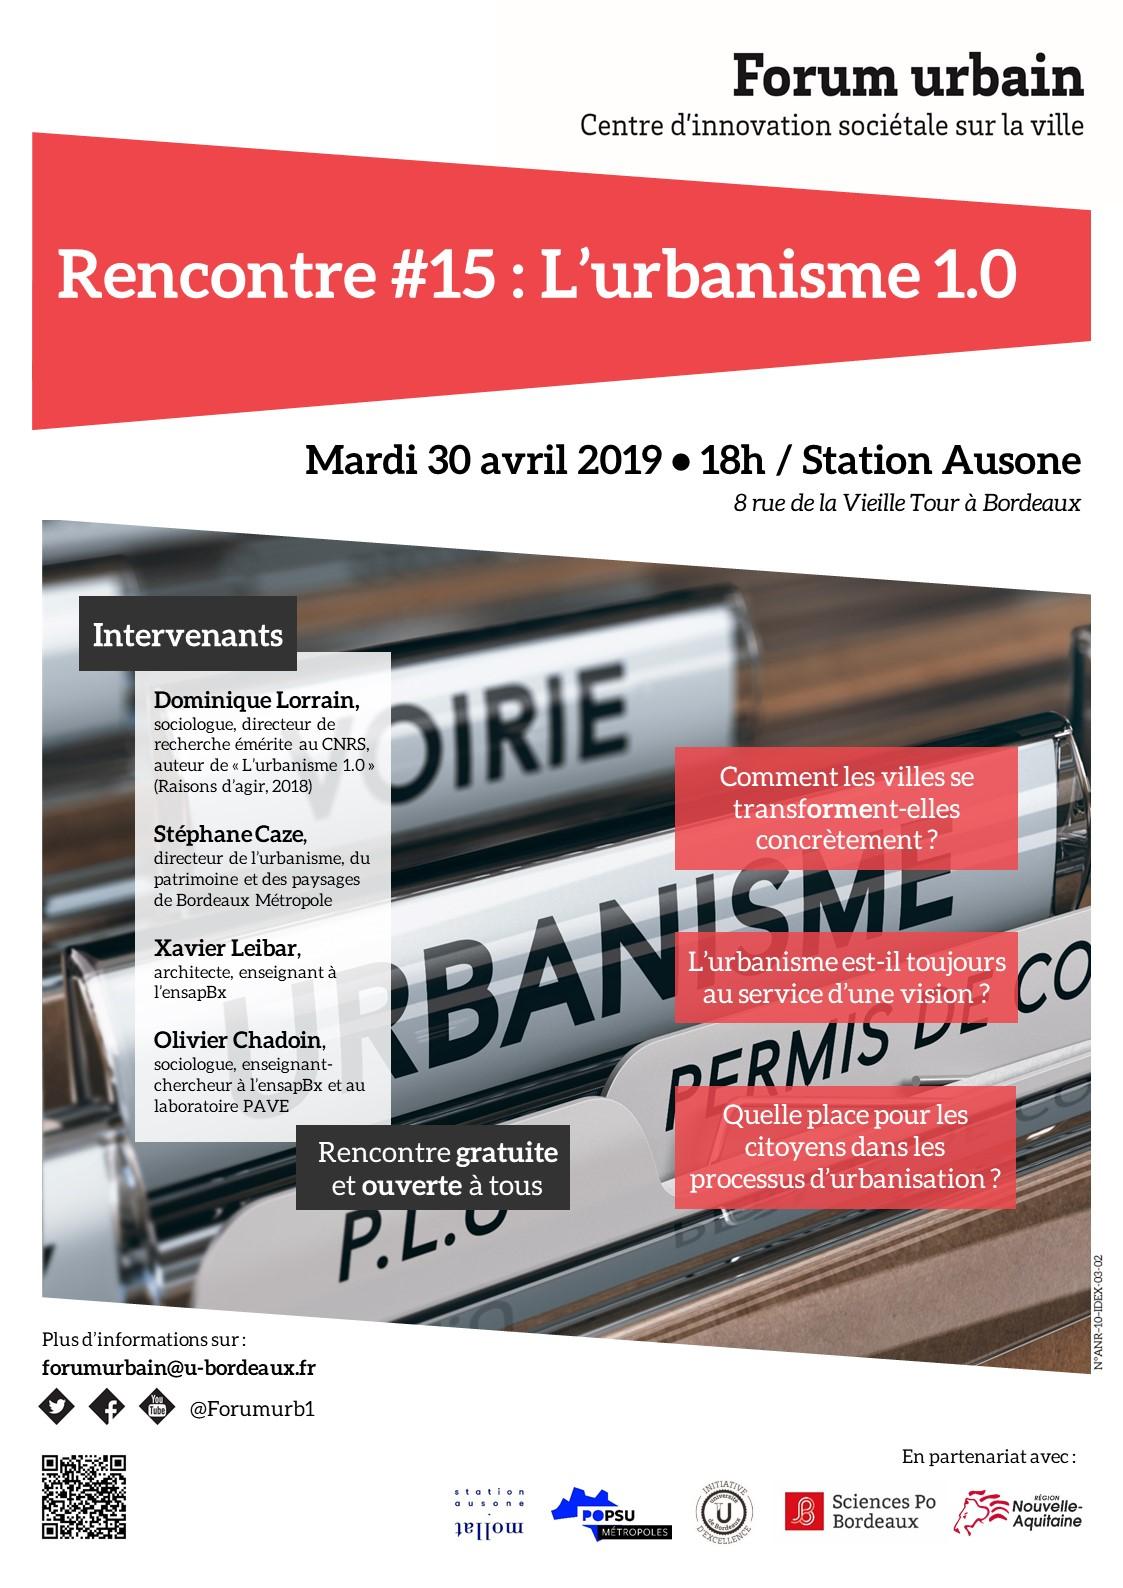 Rencontre #15 du forum urbain | 30/04/19